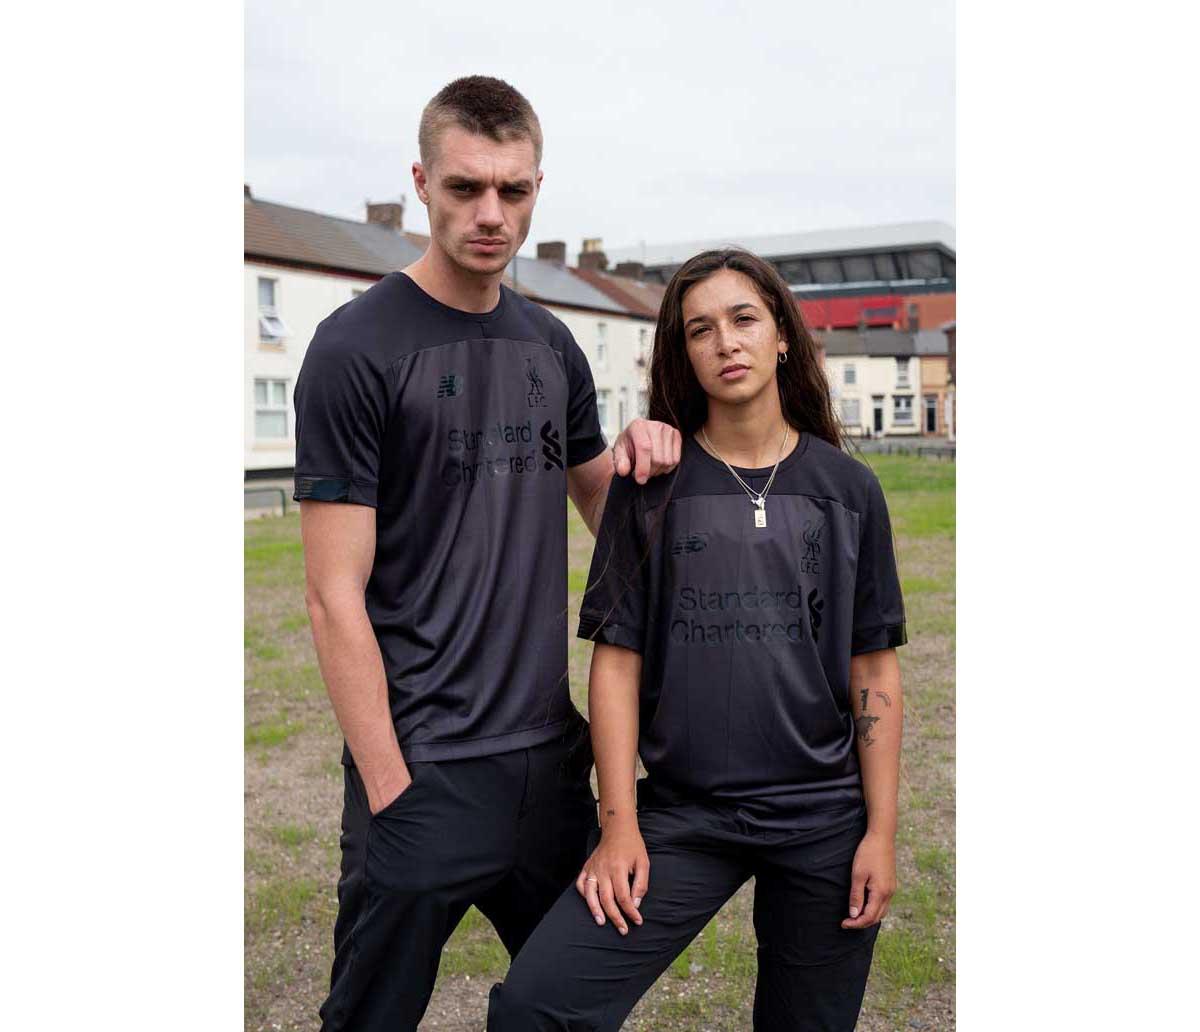 2-lfc-blackout-shirt-19-20